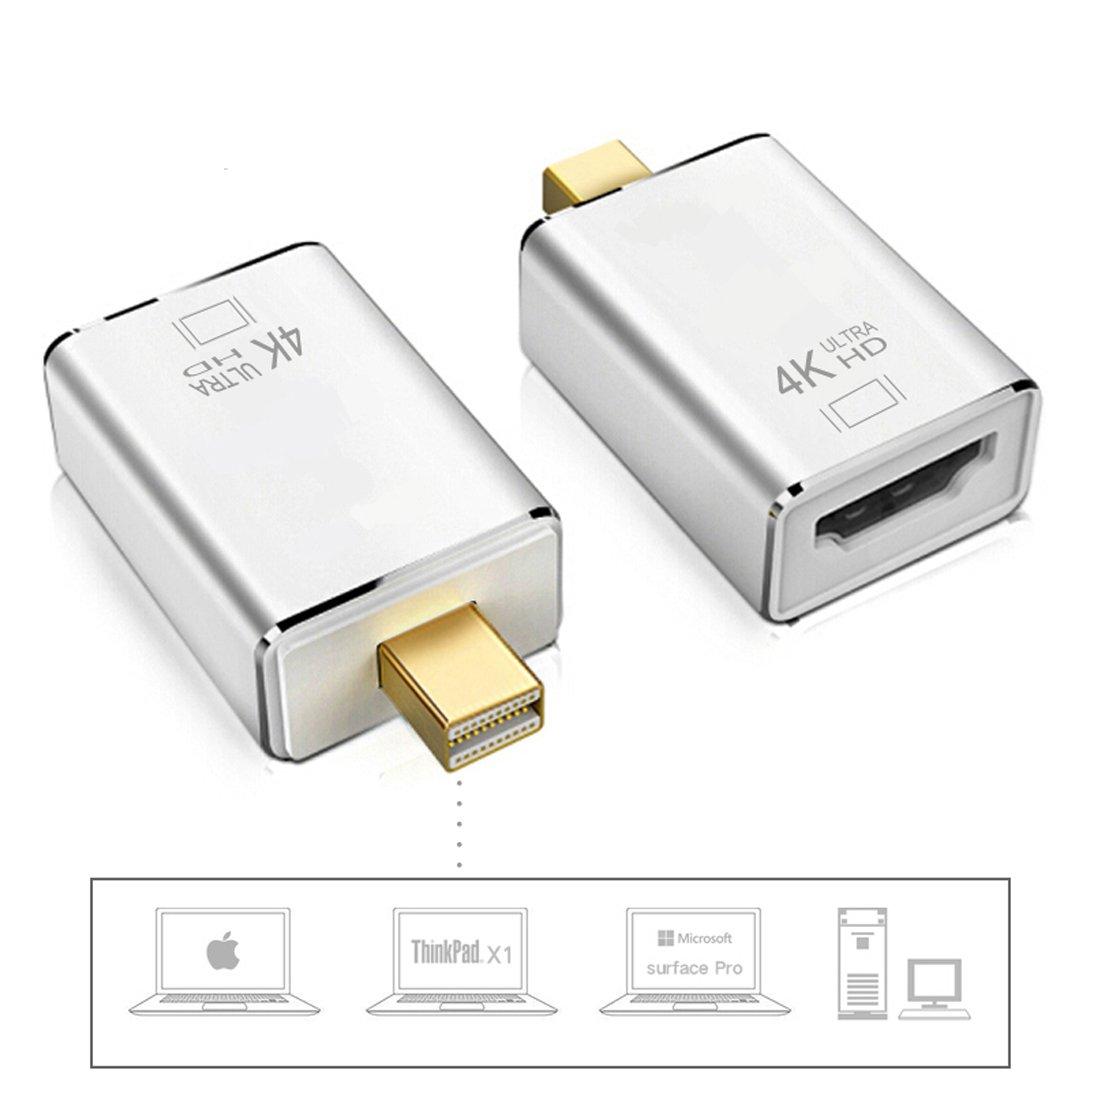 MOTONG 4K Mini DisplayPort to HDMI Adapter, Mini DP(Thunderbolt Port Compatible) to HDMI AV HDTV Male to Female Adaptor for Mac Book iMac (Silver)